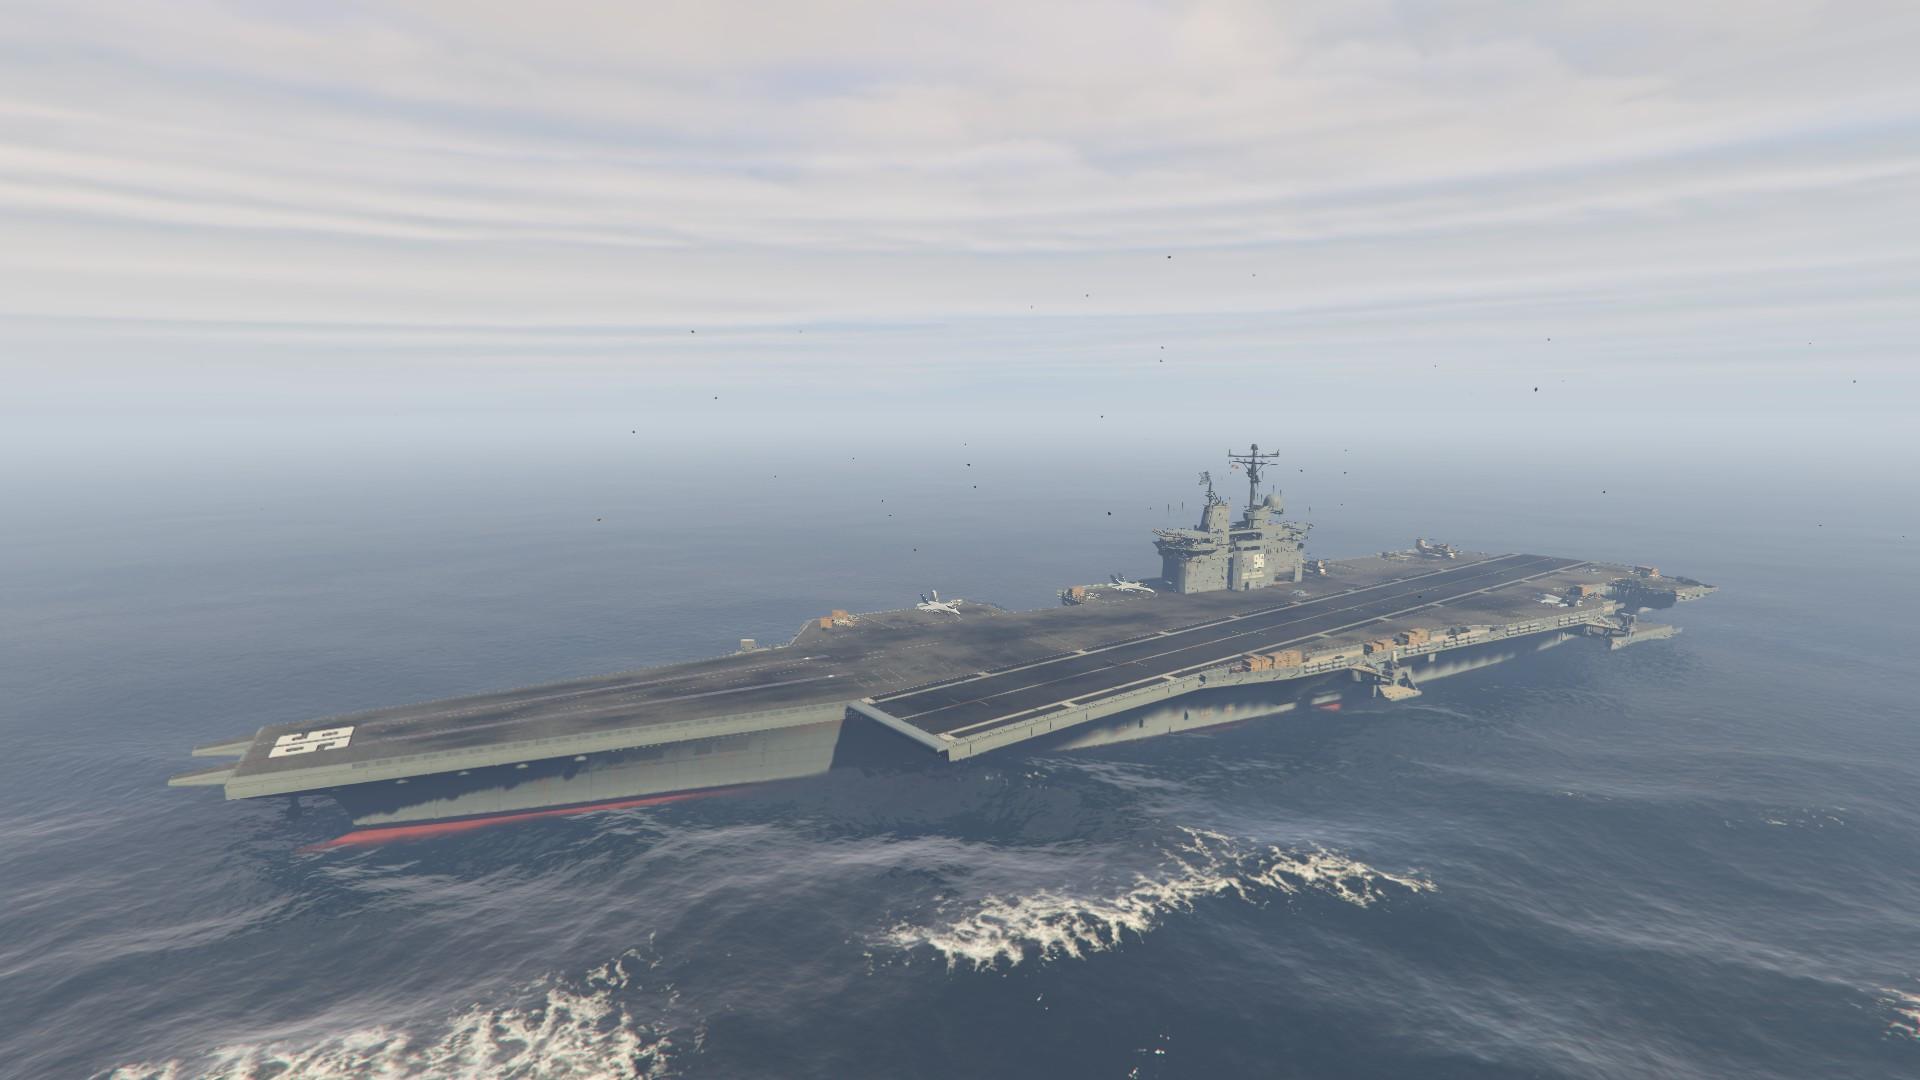 USS Luxington ATT-16